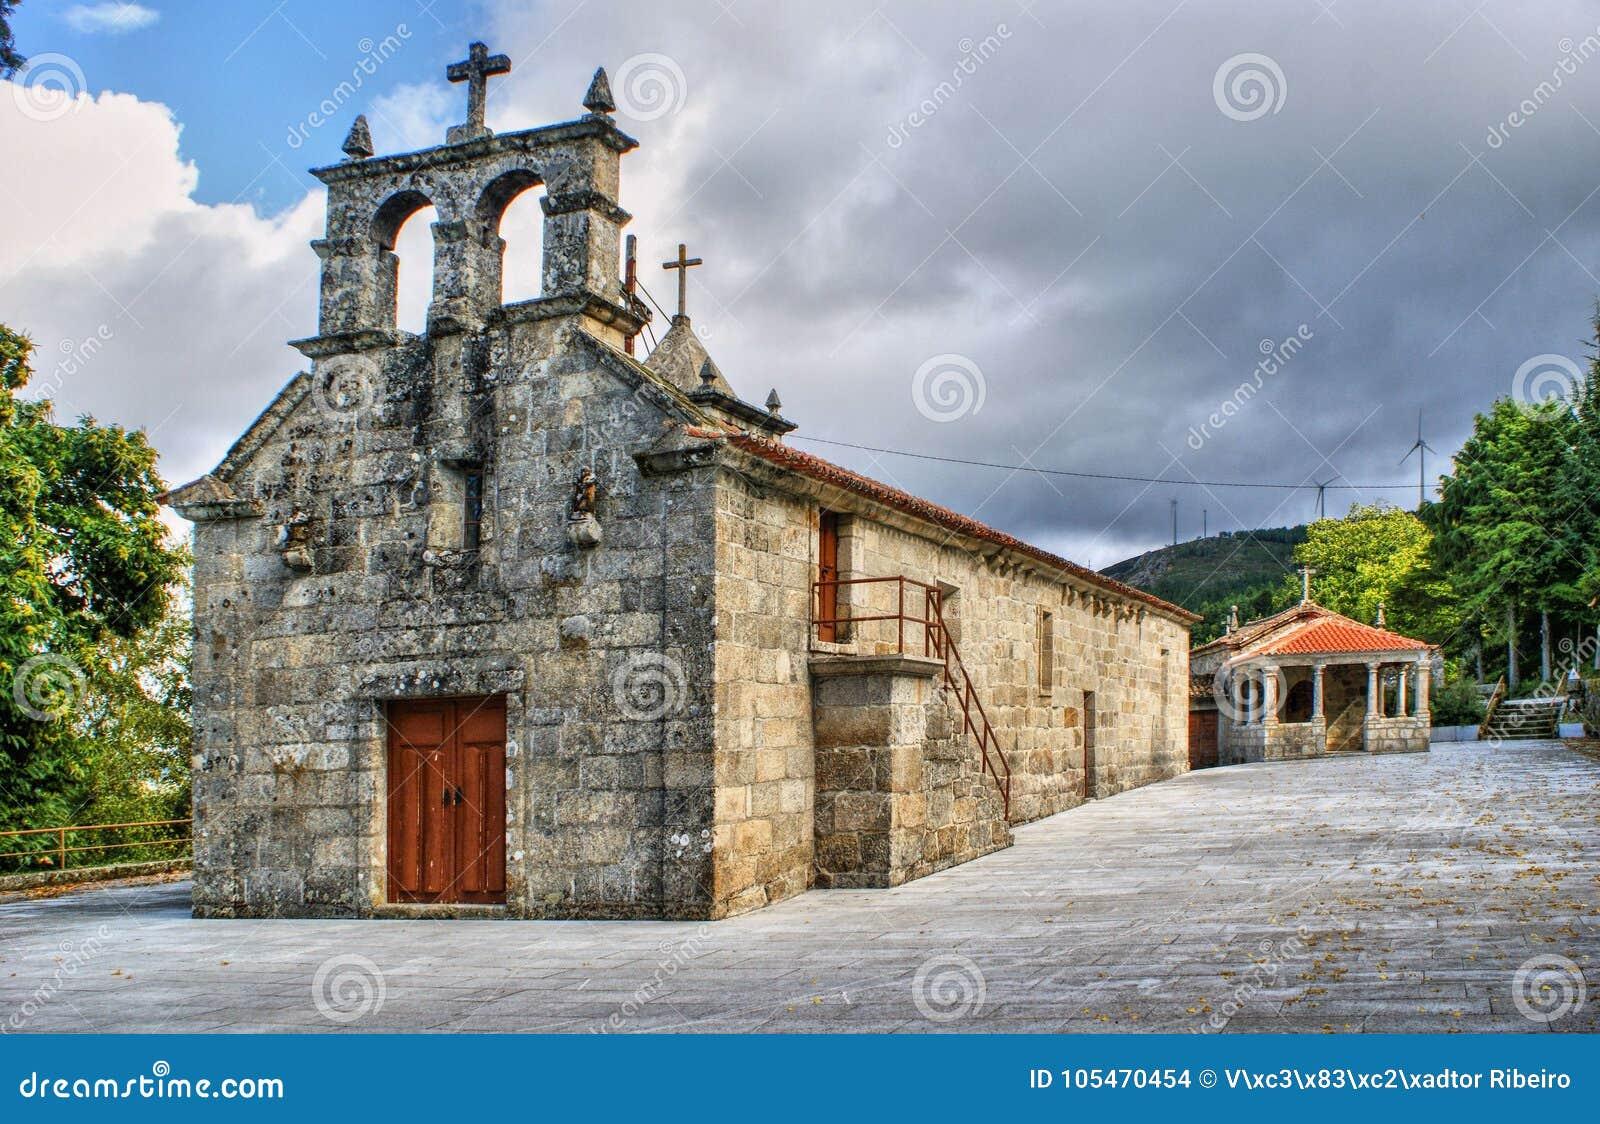 Download Old Little Church In Vila Pouca De Aguiar Stock Photo - Image of portugal, outdoor: 105470454